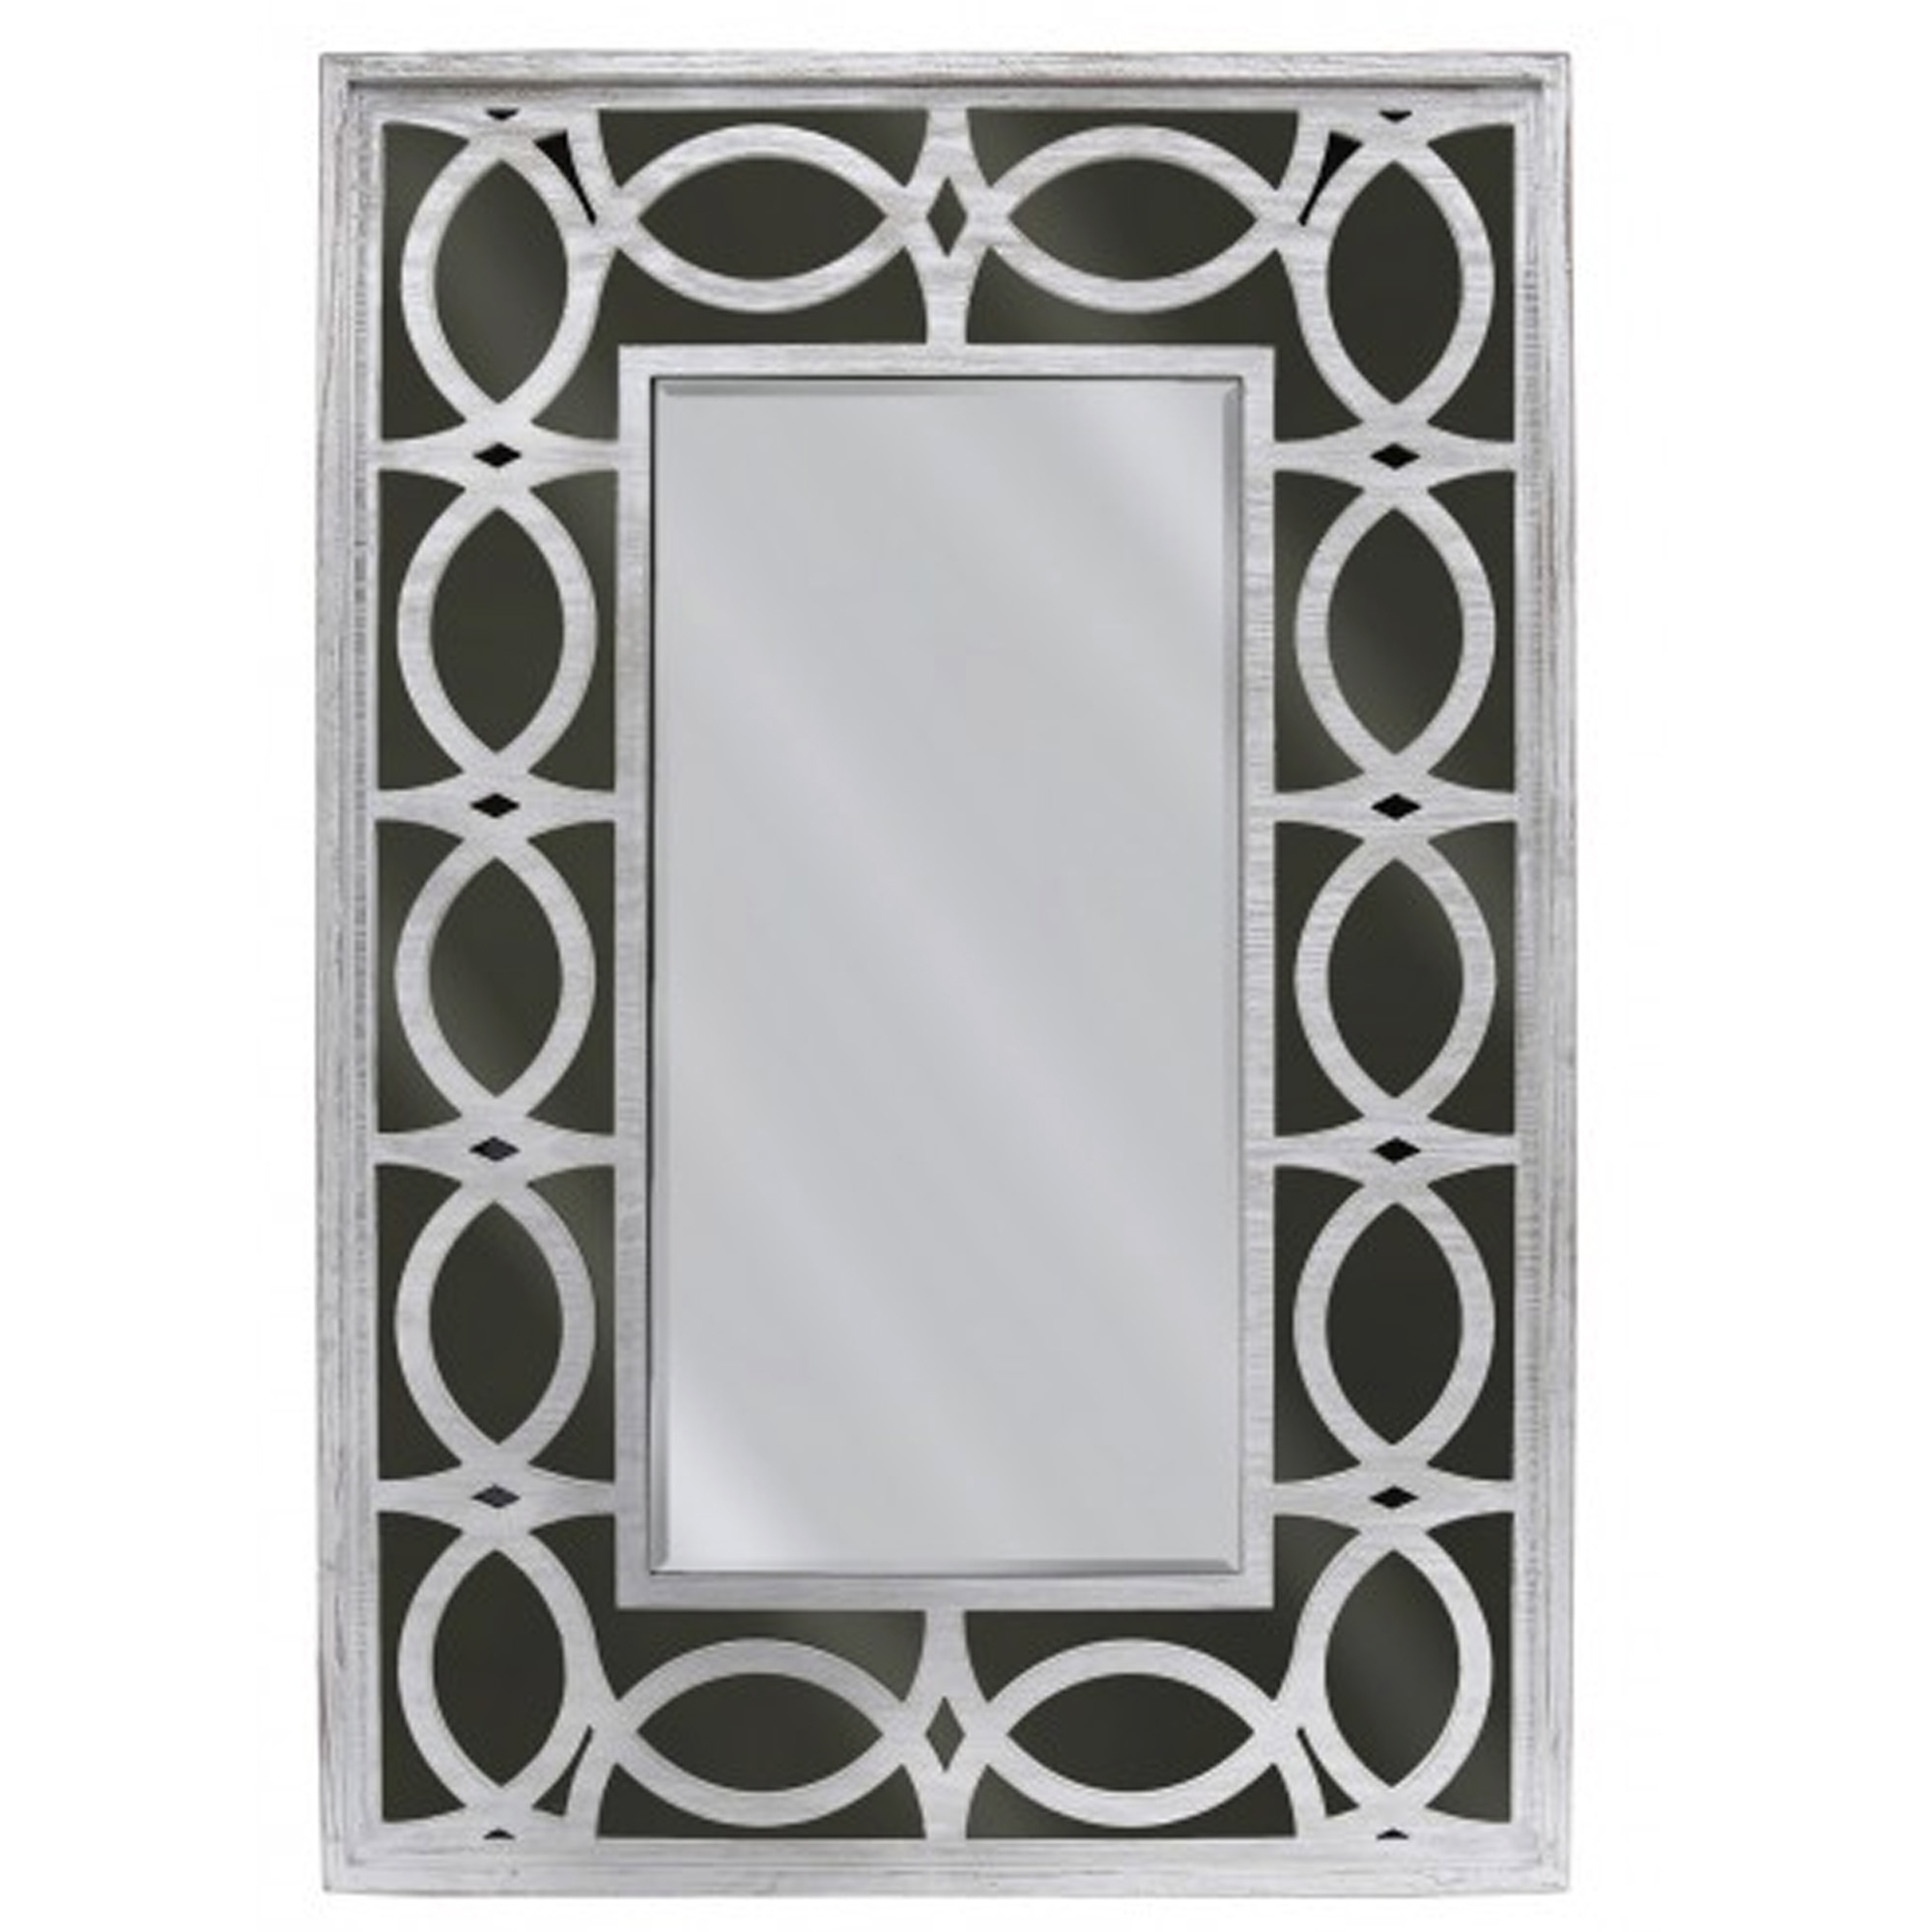 Black & Silver Decorative Wall Mirror In Favorite Decorative Black Wall Mirrors (View 1 of 20)